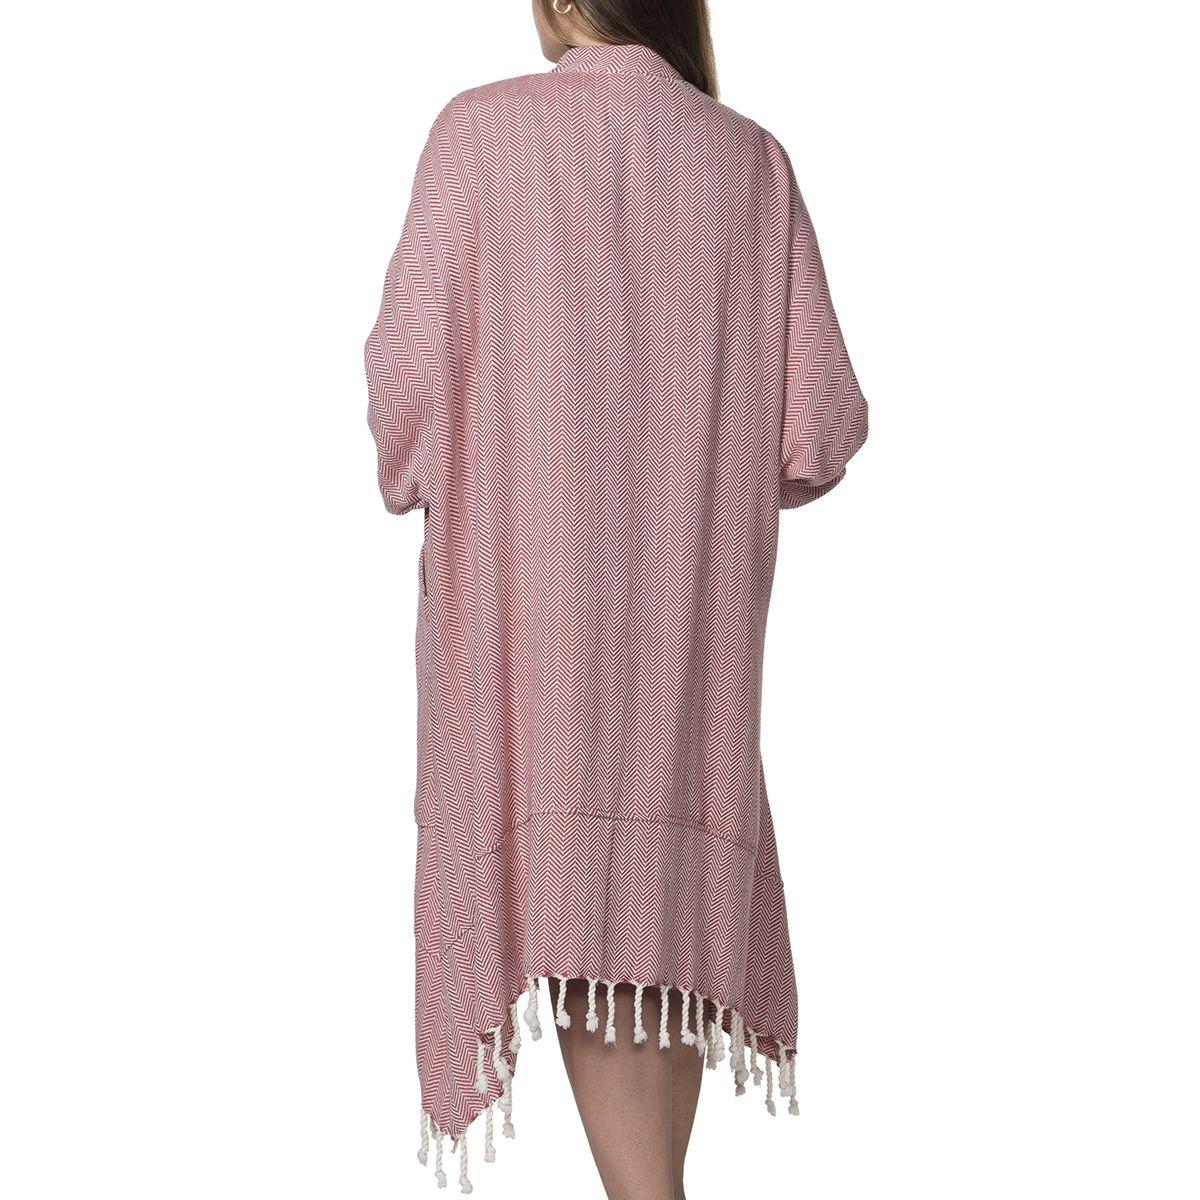 Elbise Zigzag - Gül Kurusu